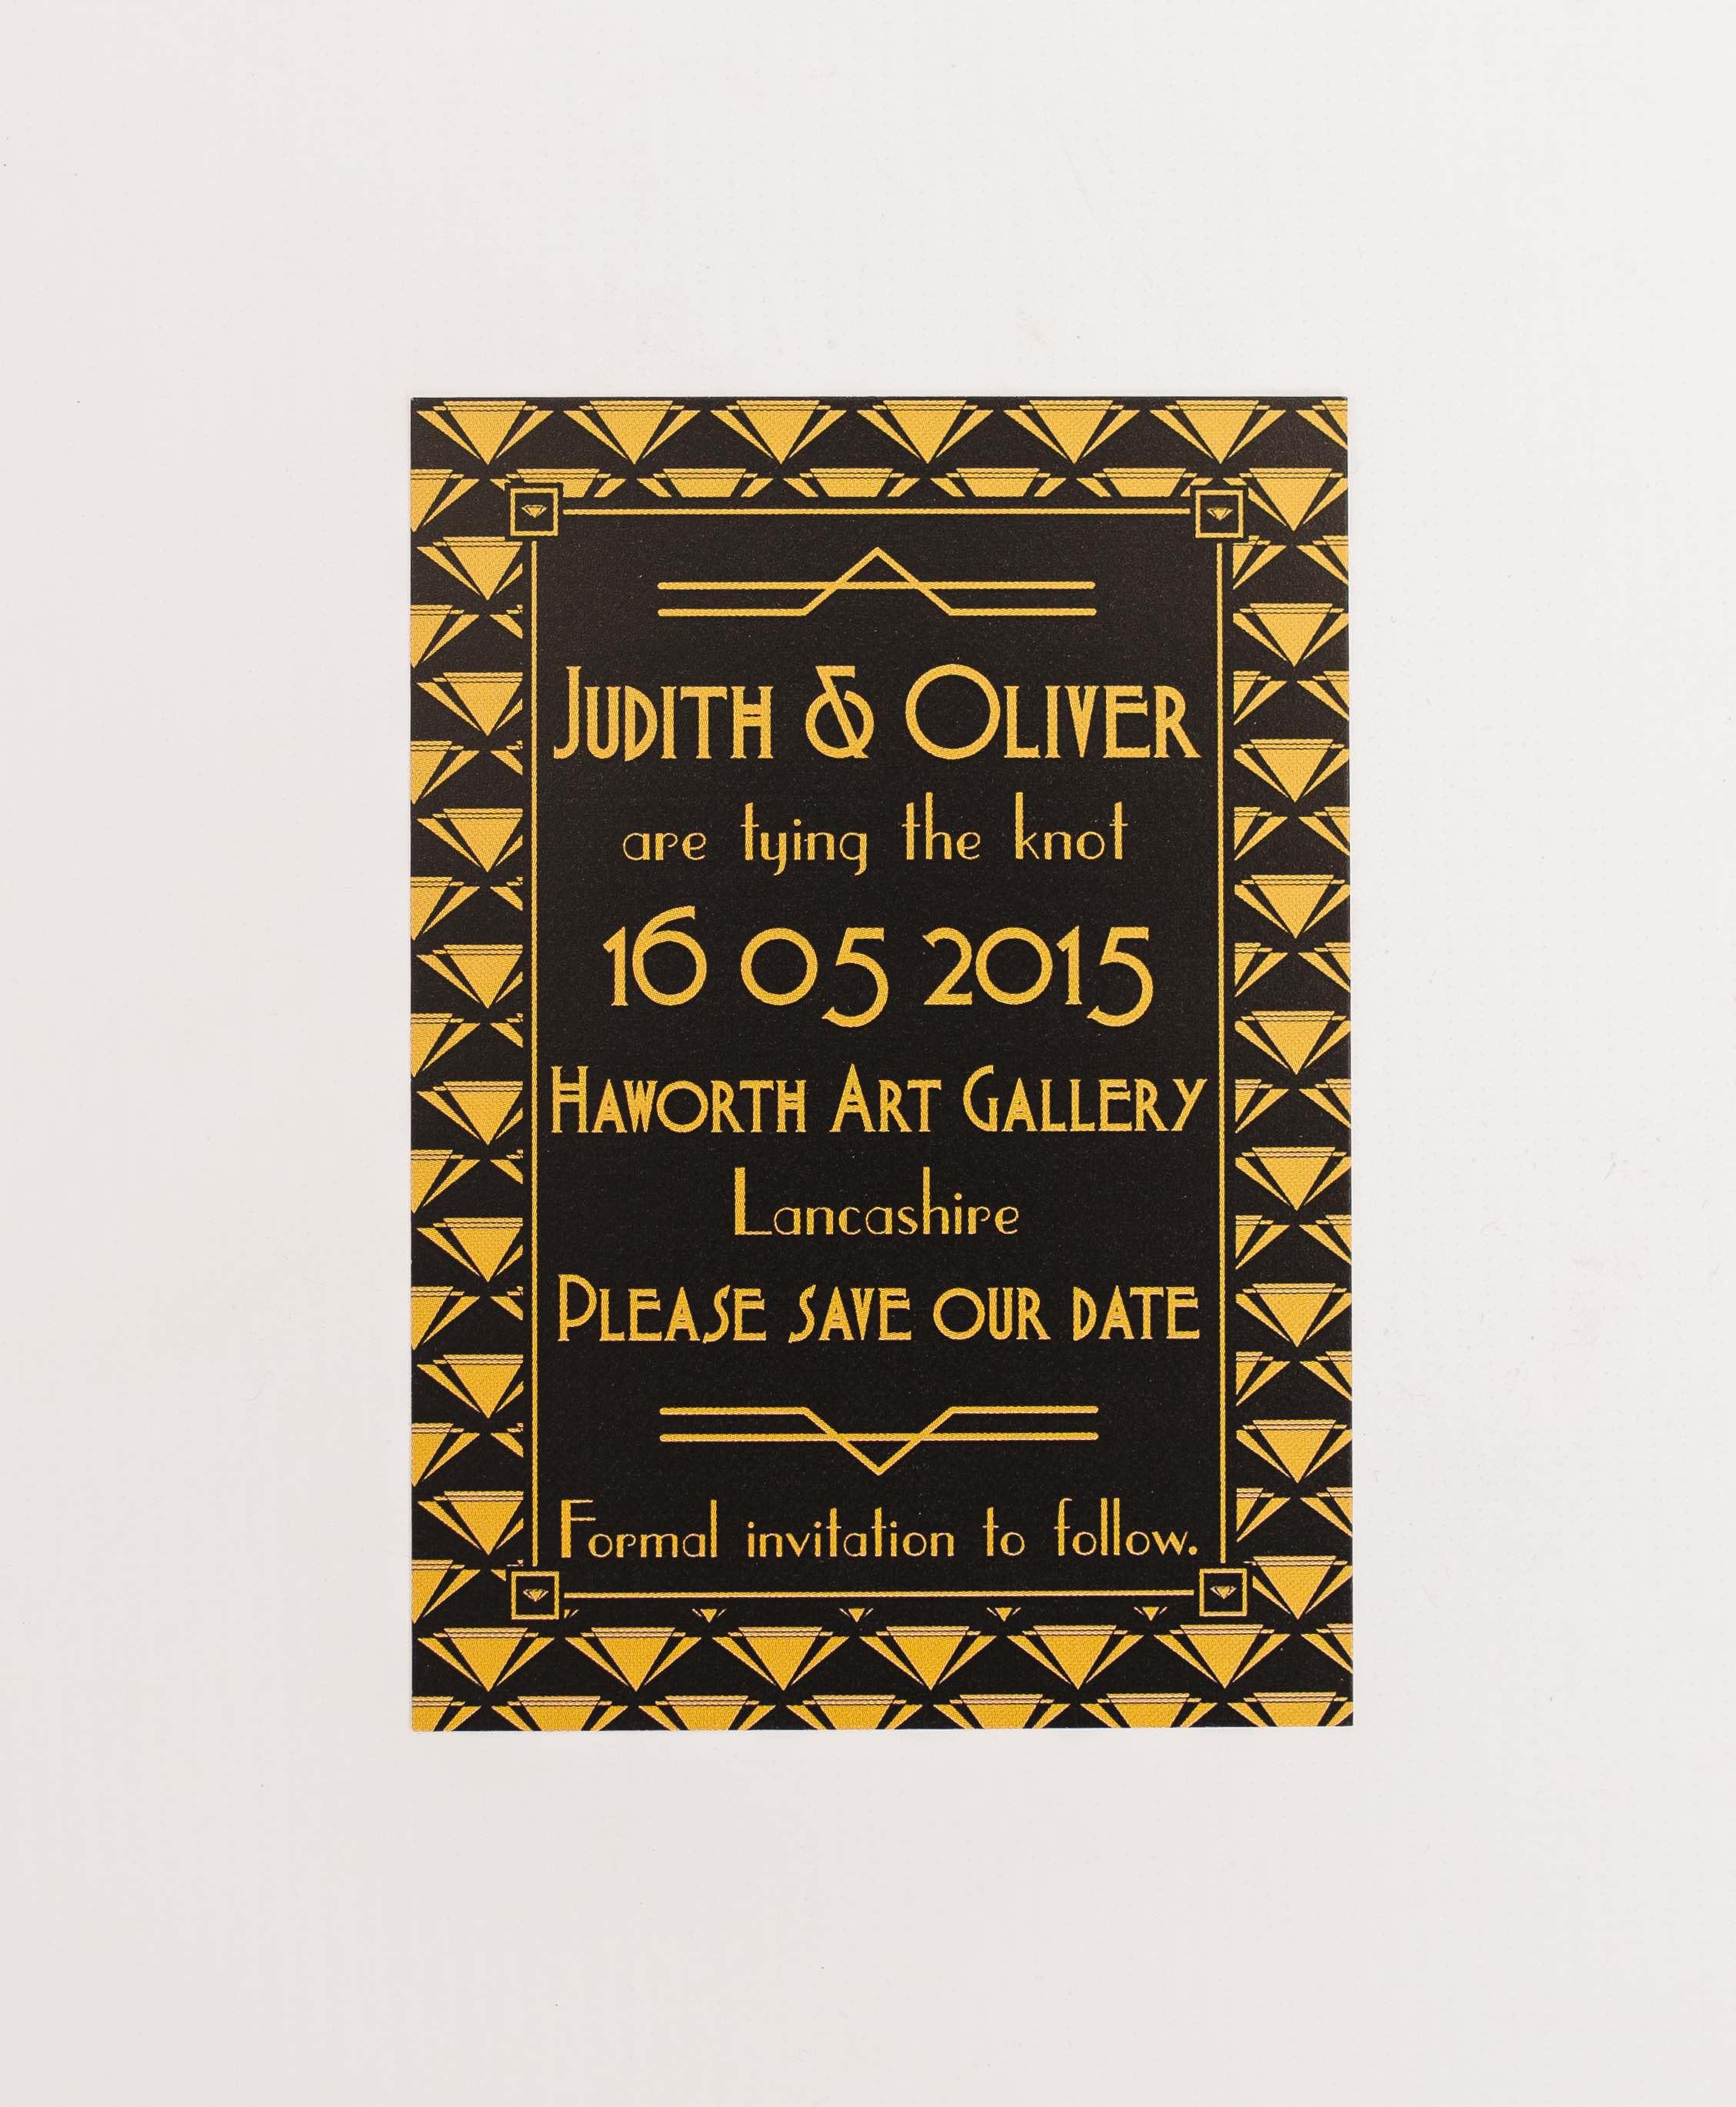 1920s Art Deco Save the Date Card.jpg